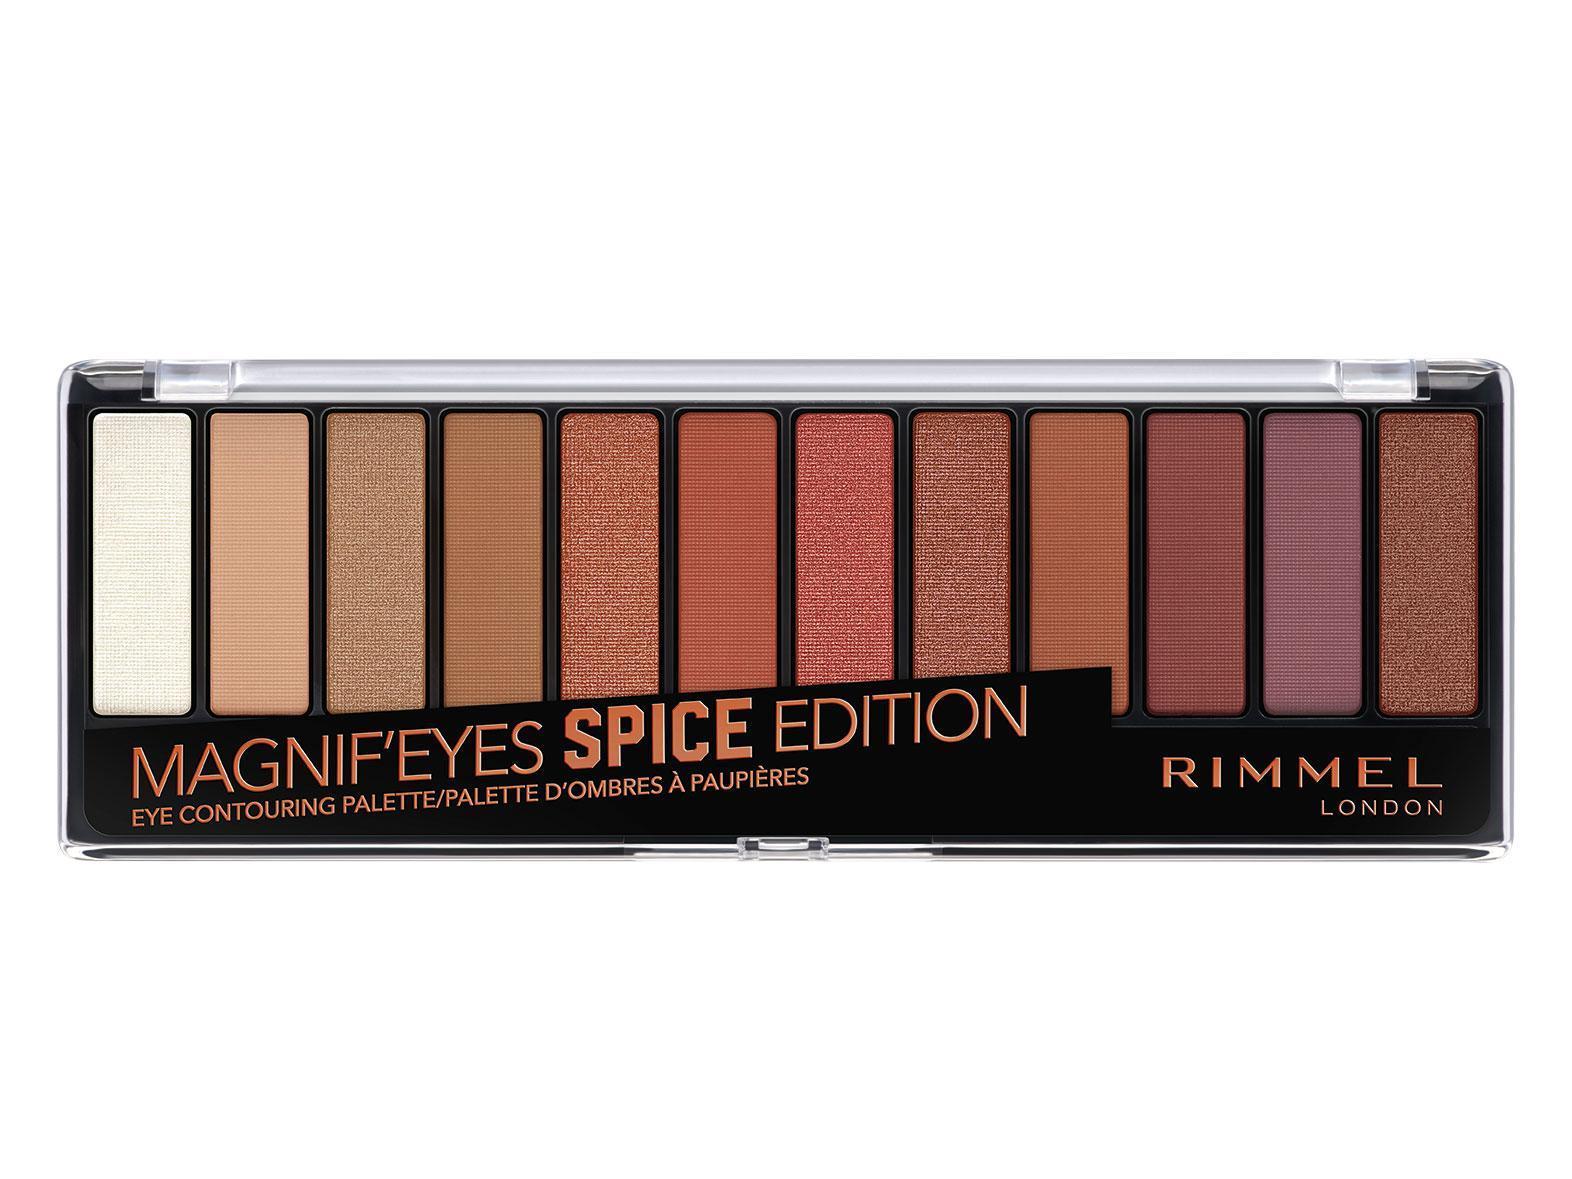 10 Best Eyeshadow Palettes The Independent